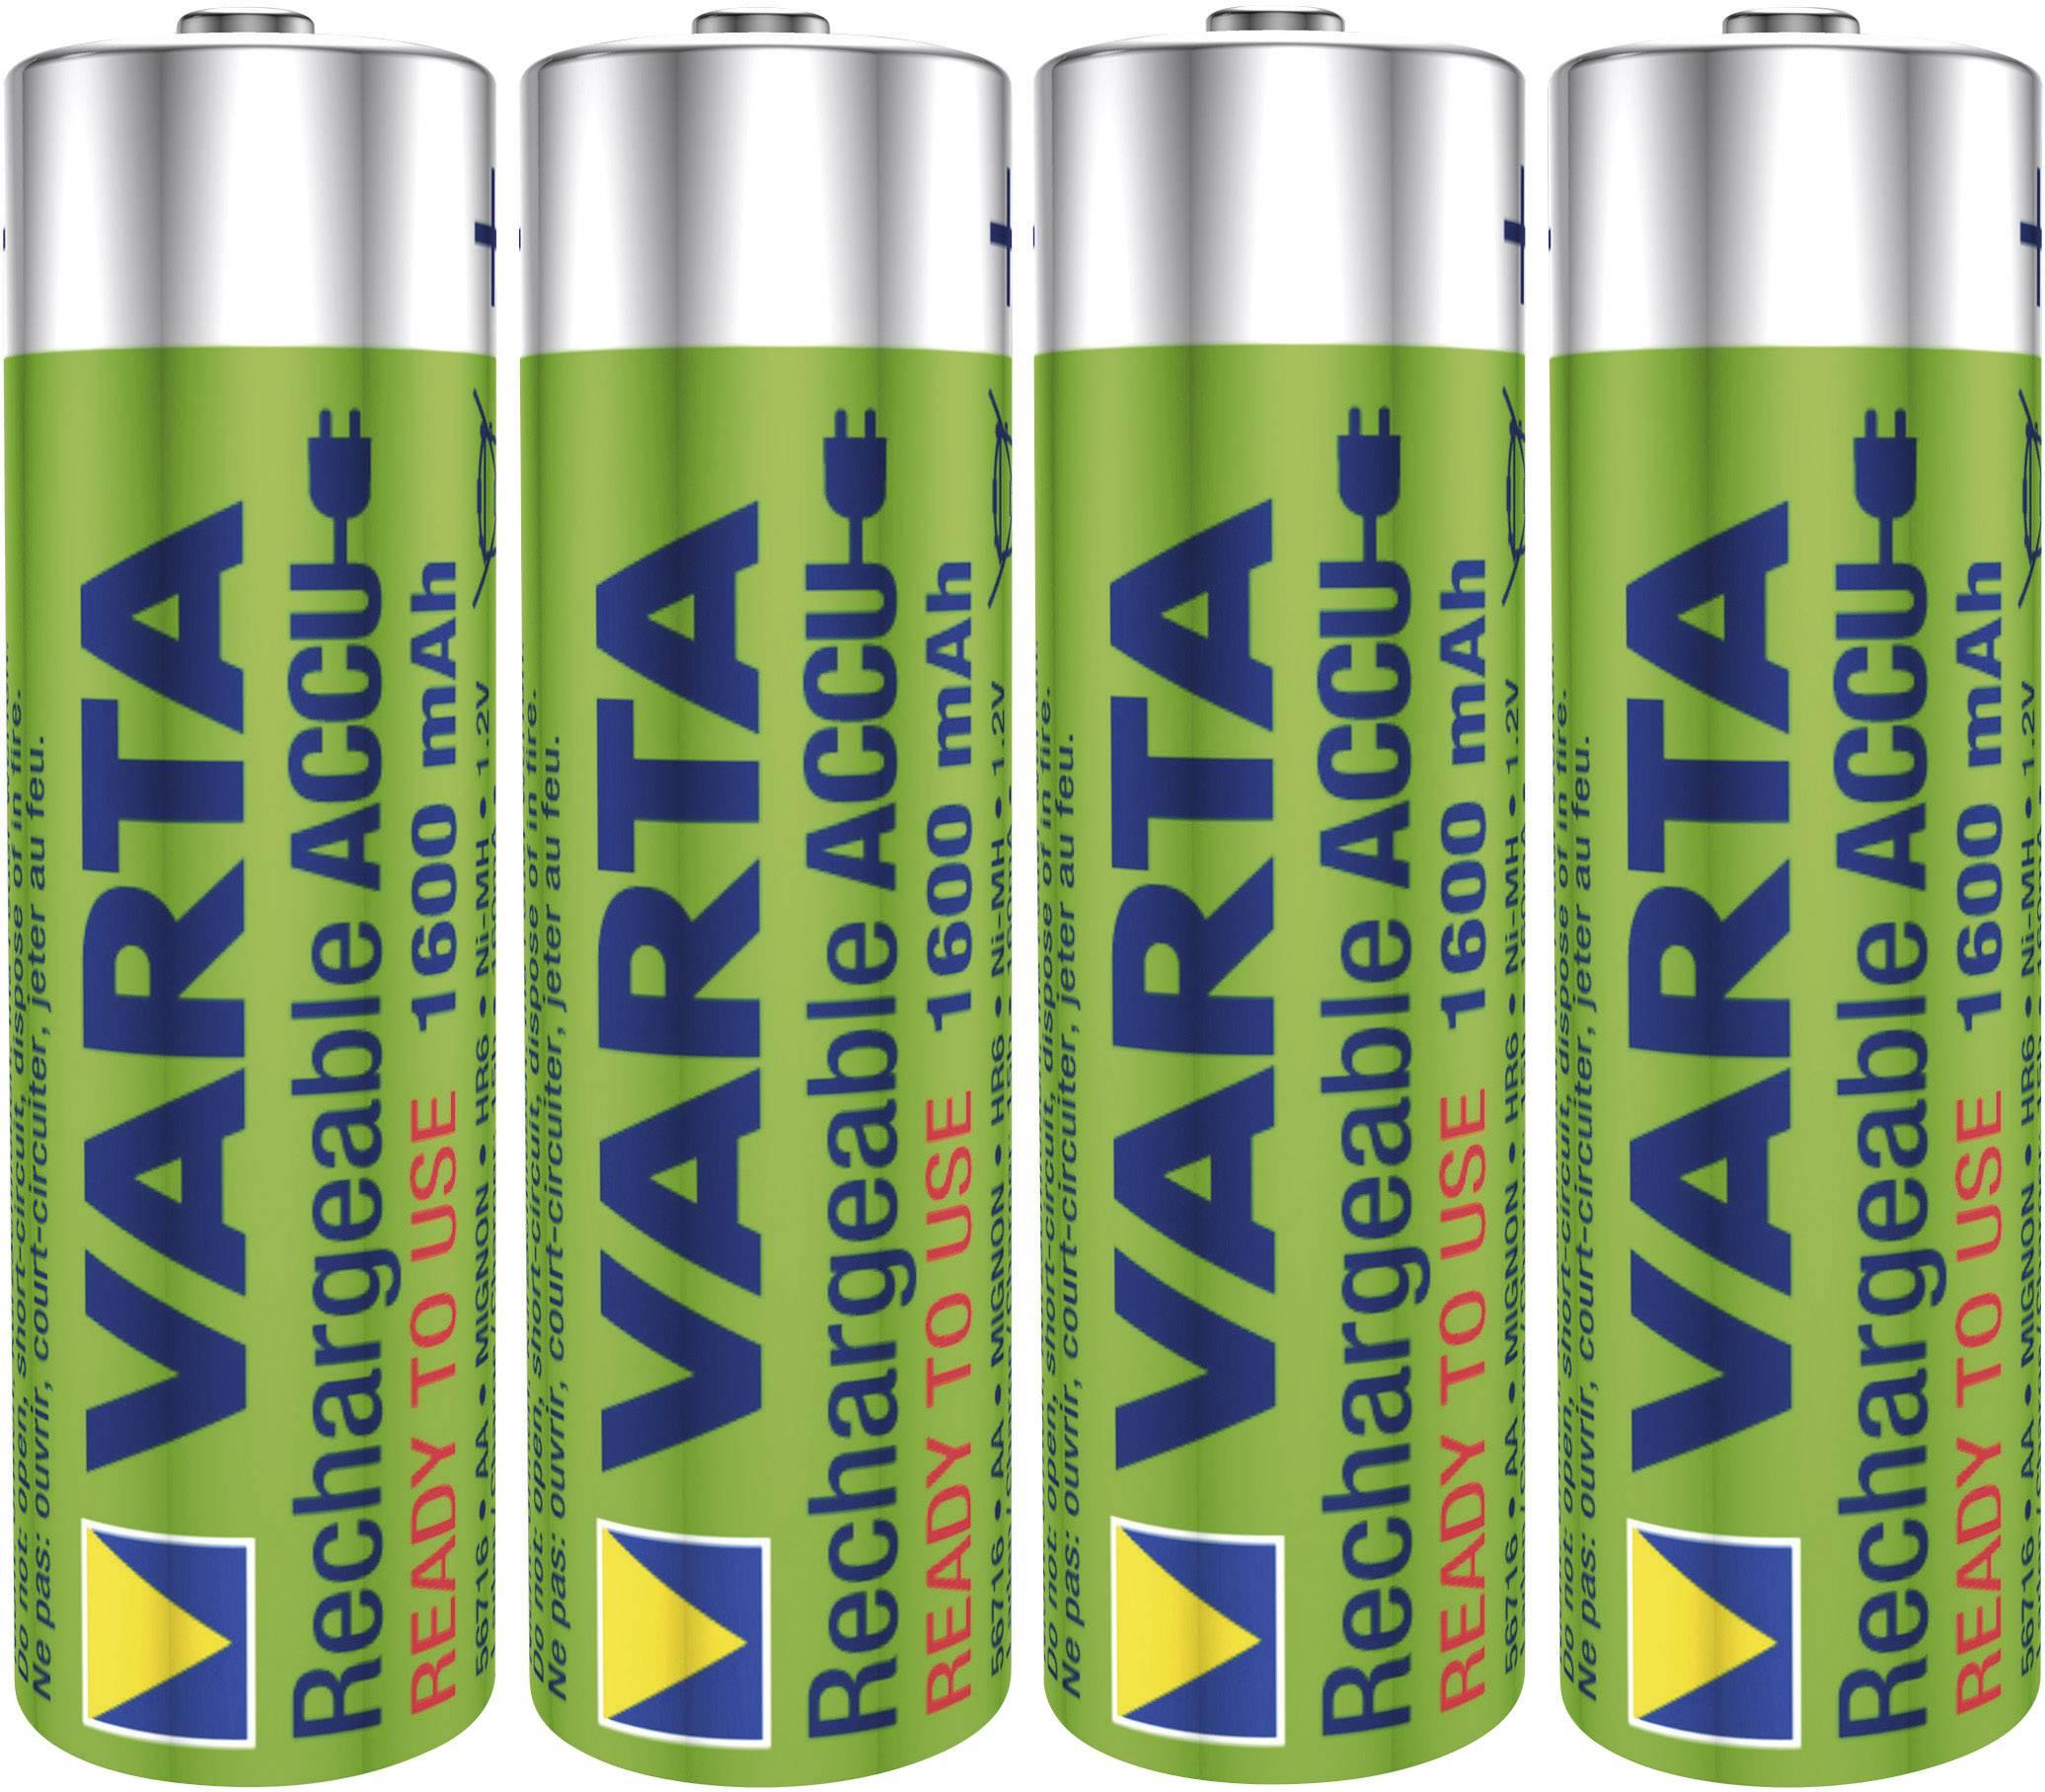 Tužkový akumulátor typu AA NiMH Varta Ready2Use HR06 56716101404, 1600 mAh, 1.2 V, 4 ks